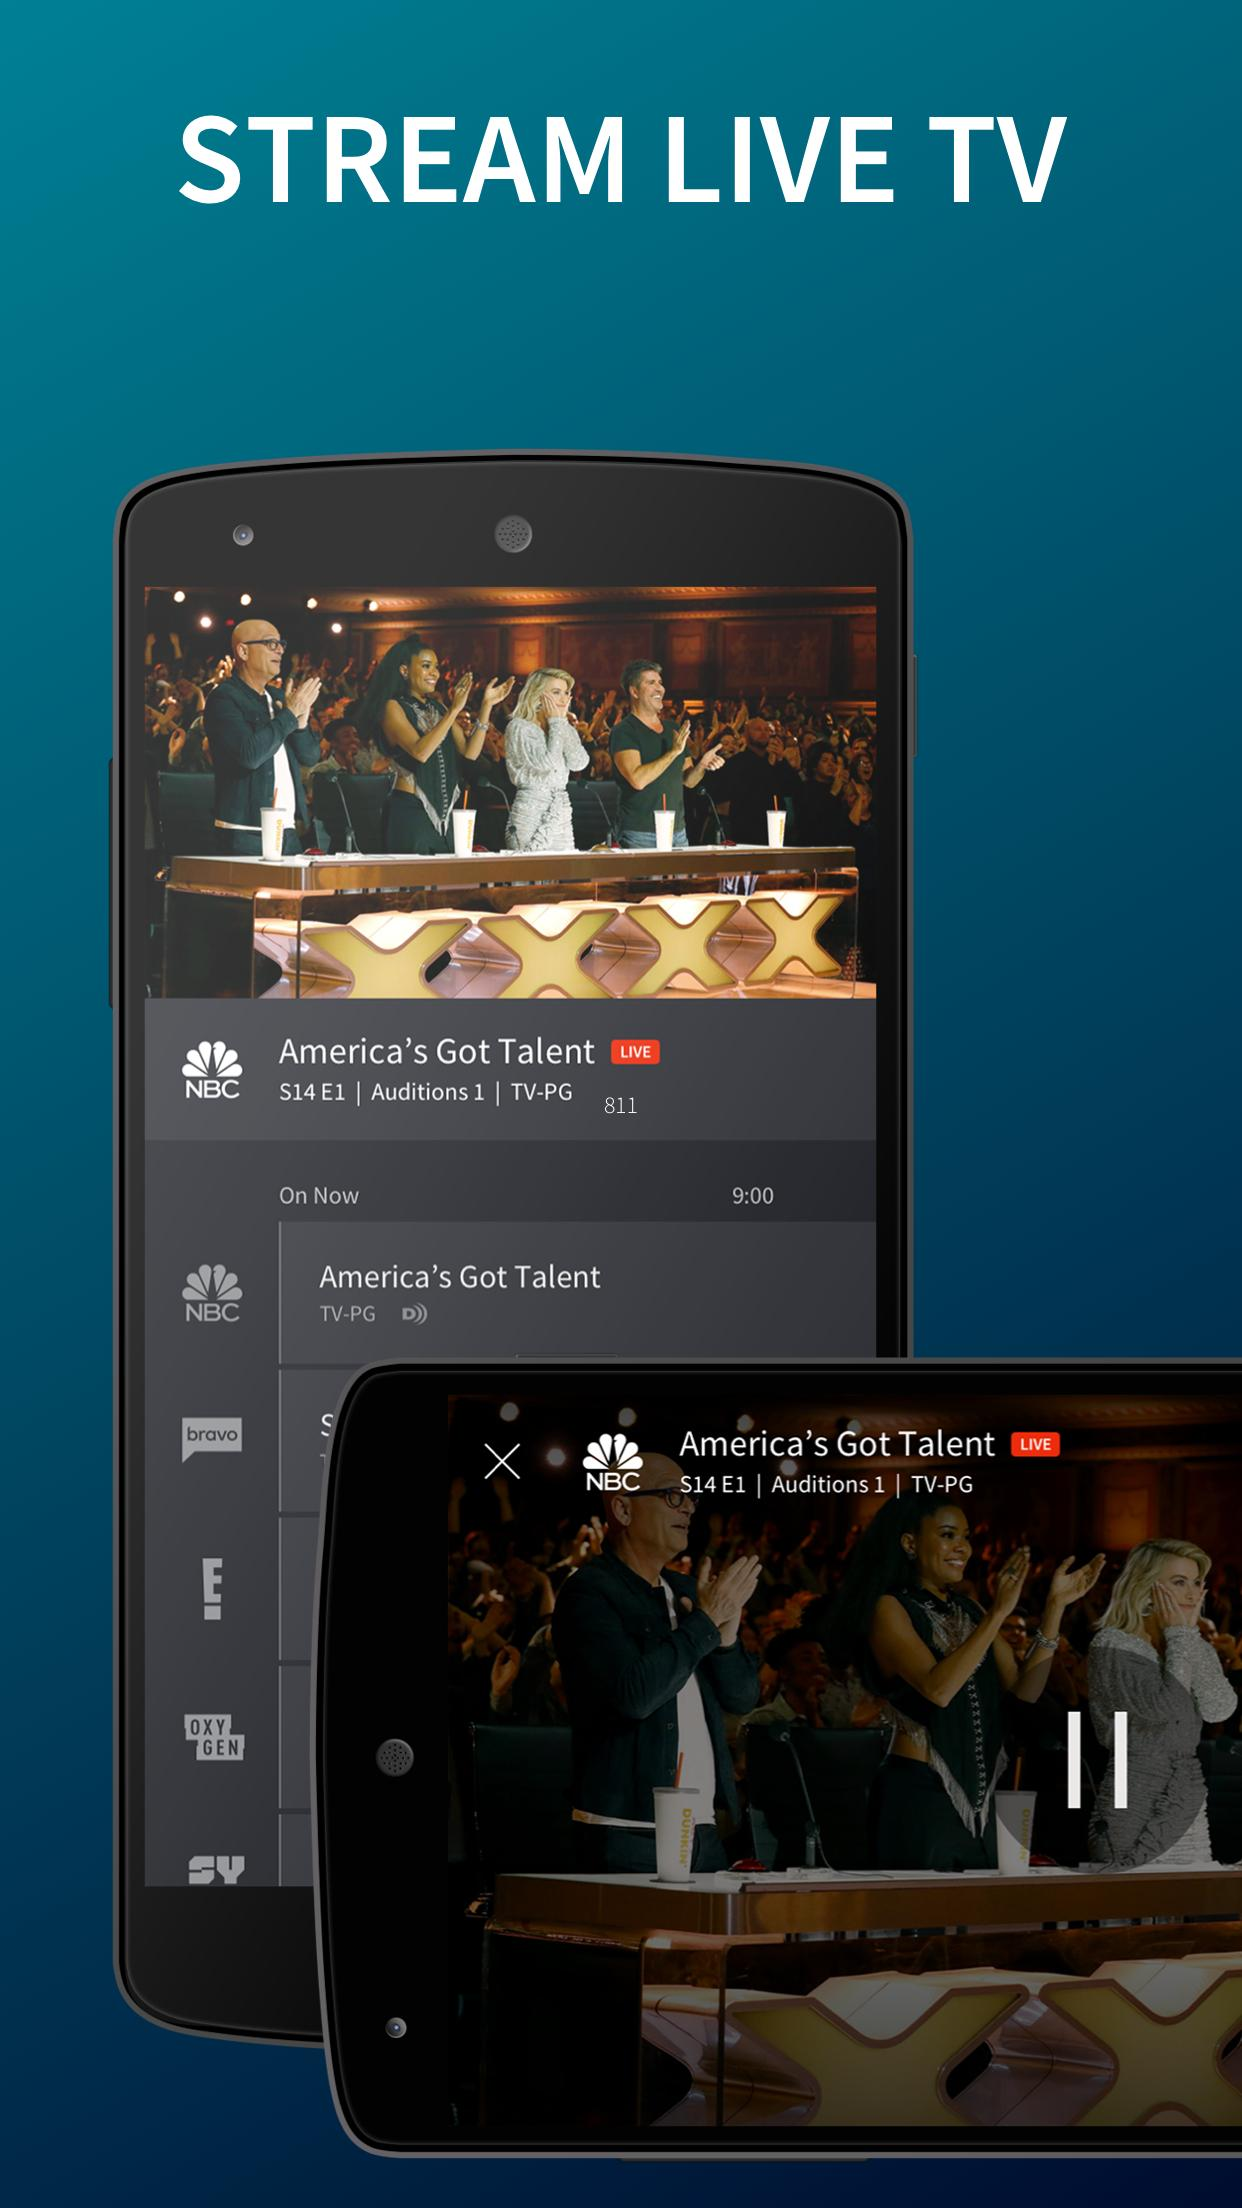 download nbc app on firestick